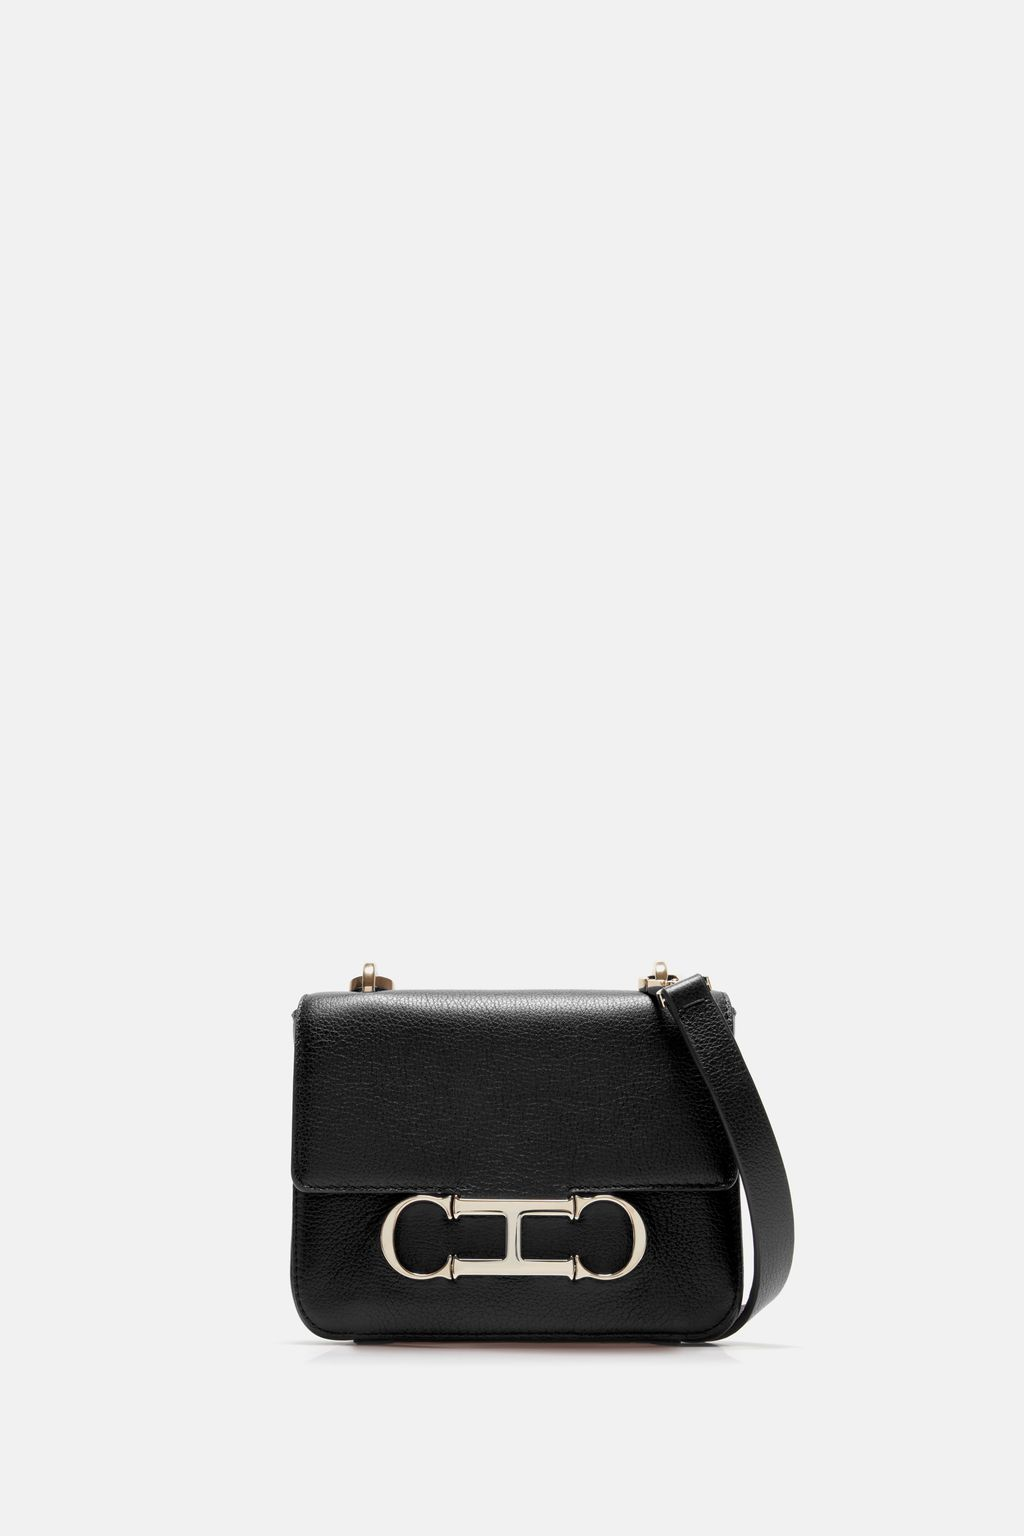 Tiny Initials Insignia | Mini cross body bag